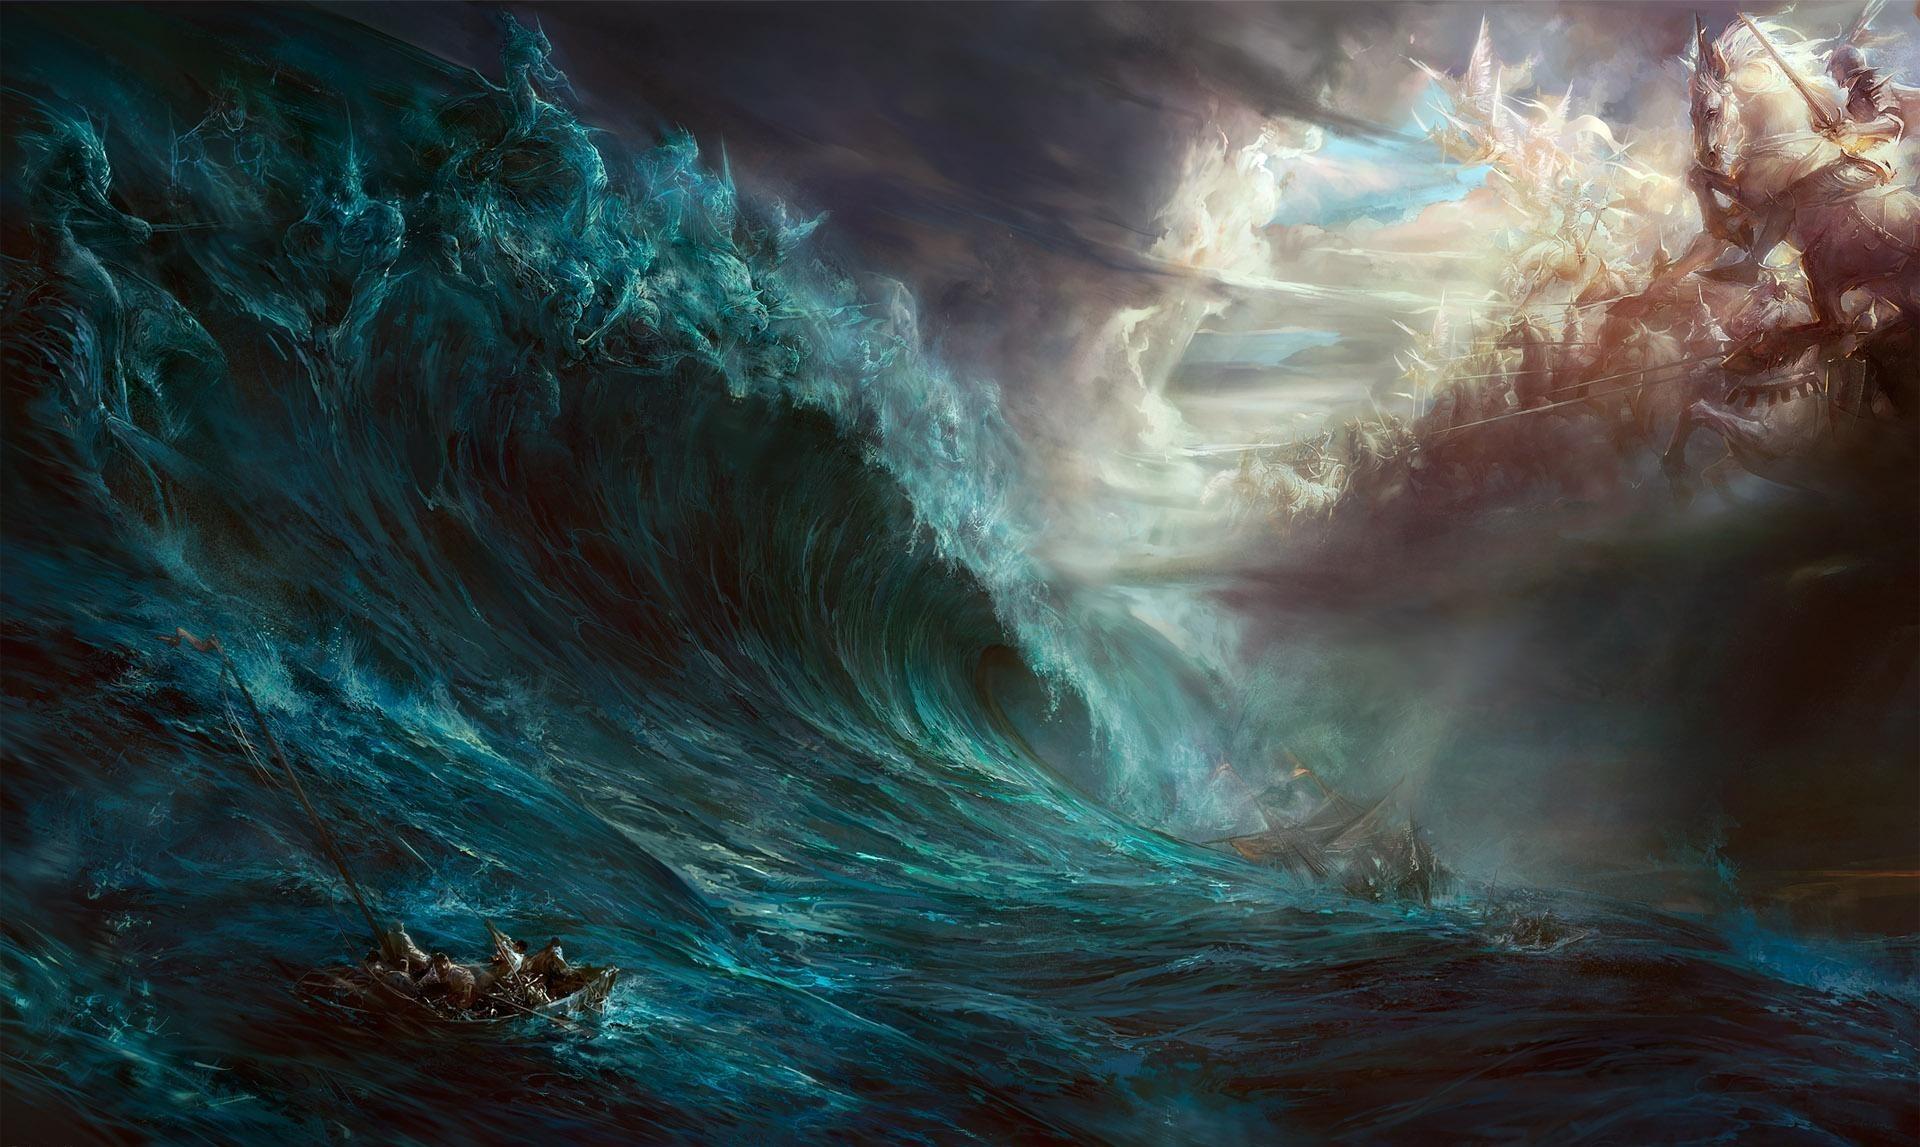 General fantasy art Heaven & Hell sea boat storm